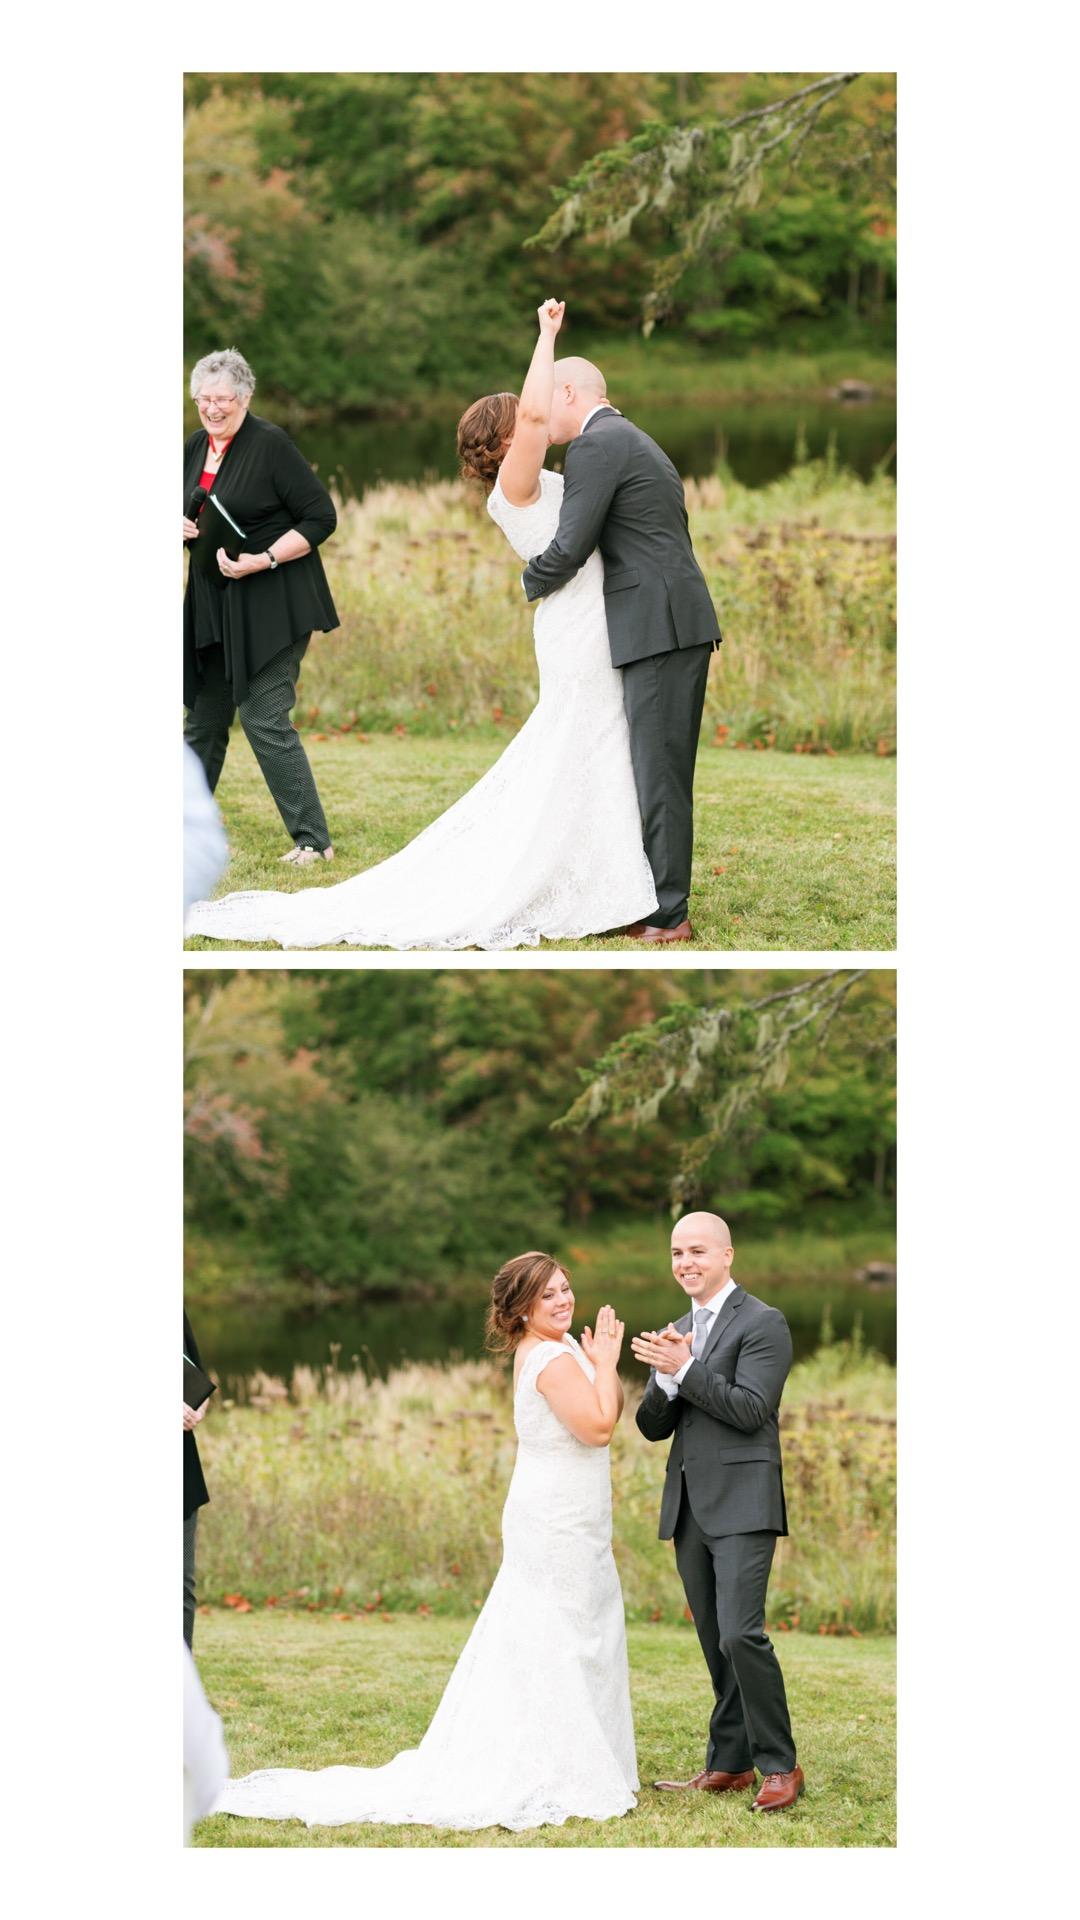 IMG-6015.JPGKatherine & Roger: Wedding Day Previews | Nova Scotia Wedding Photographer